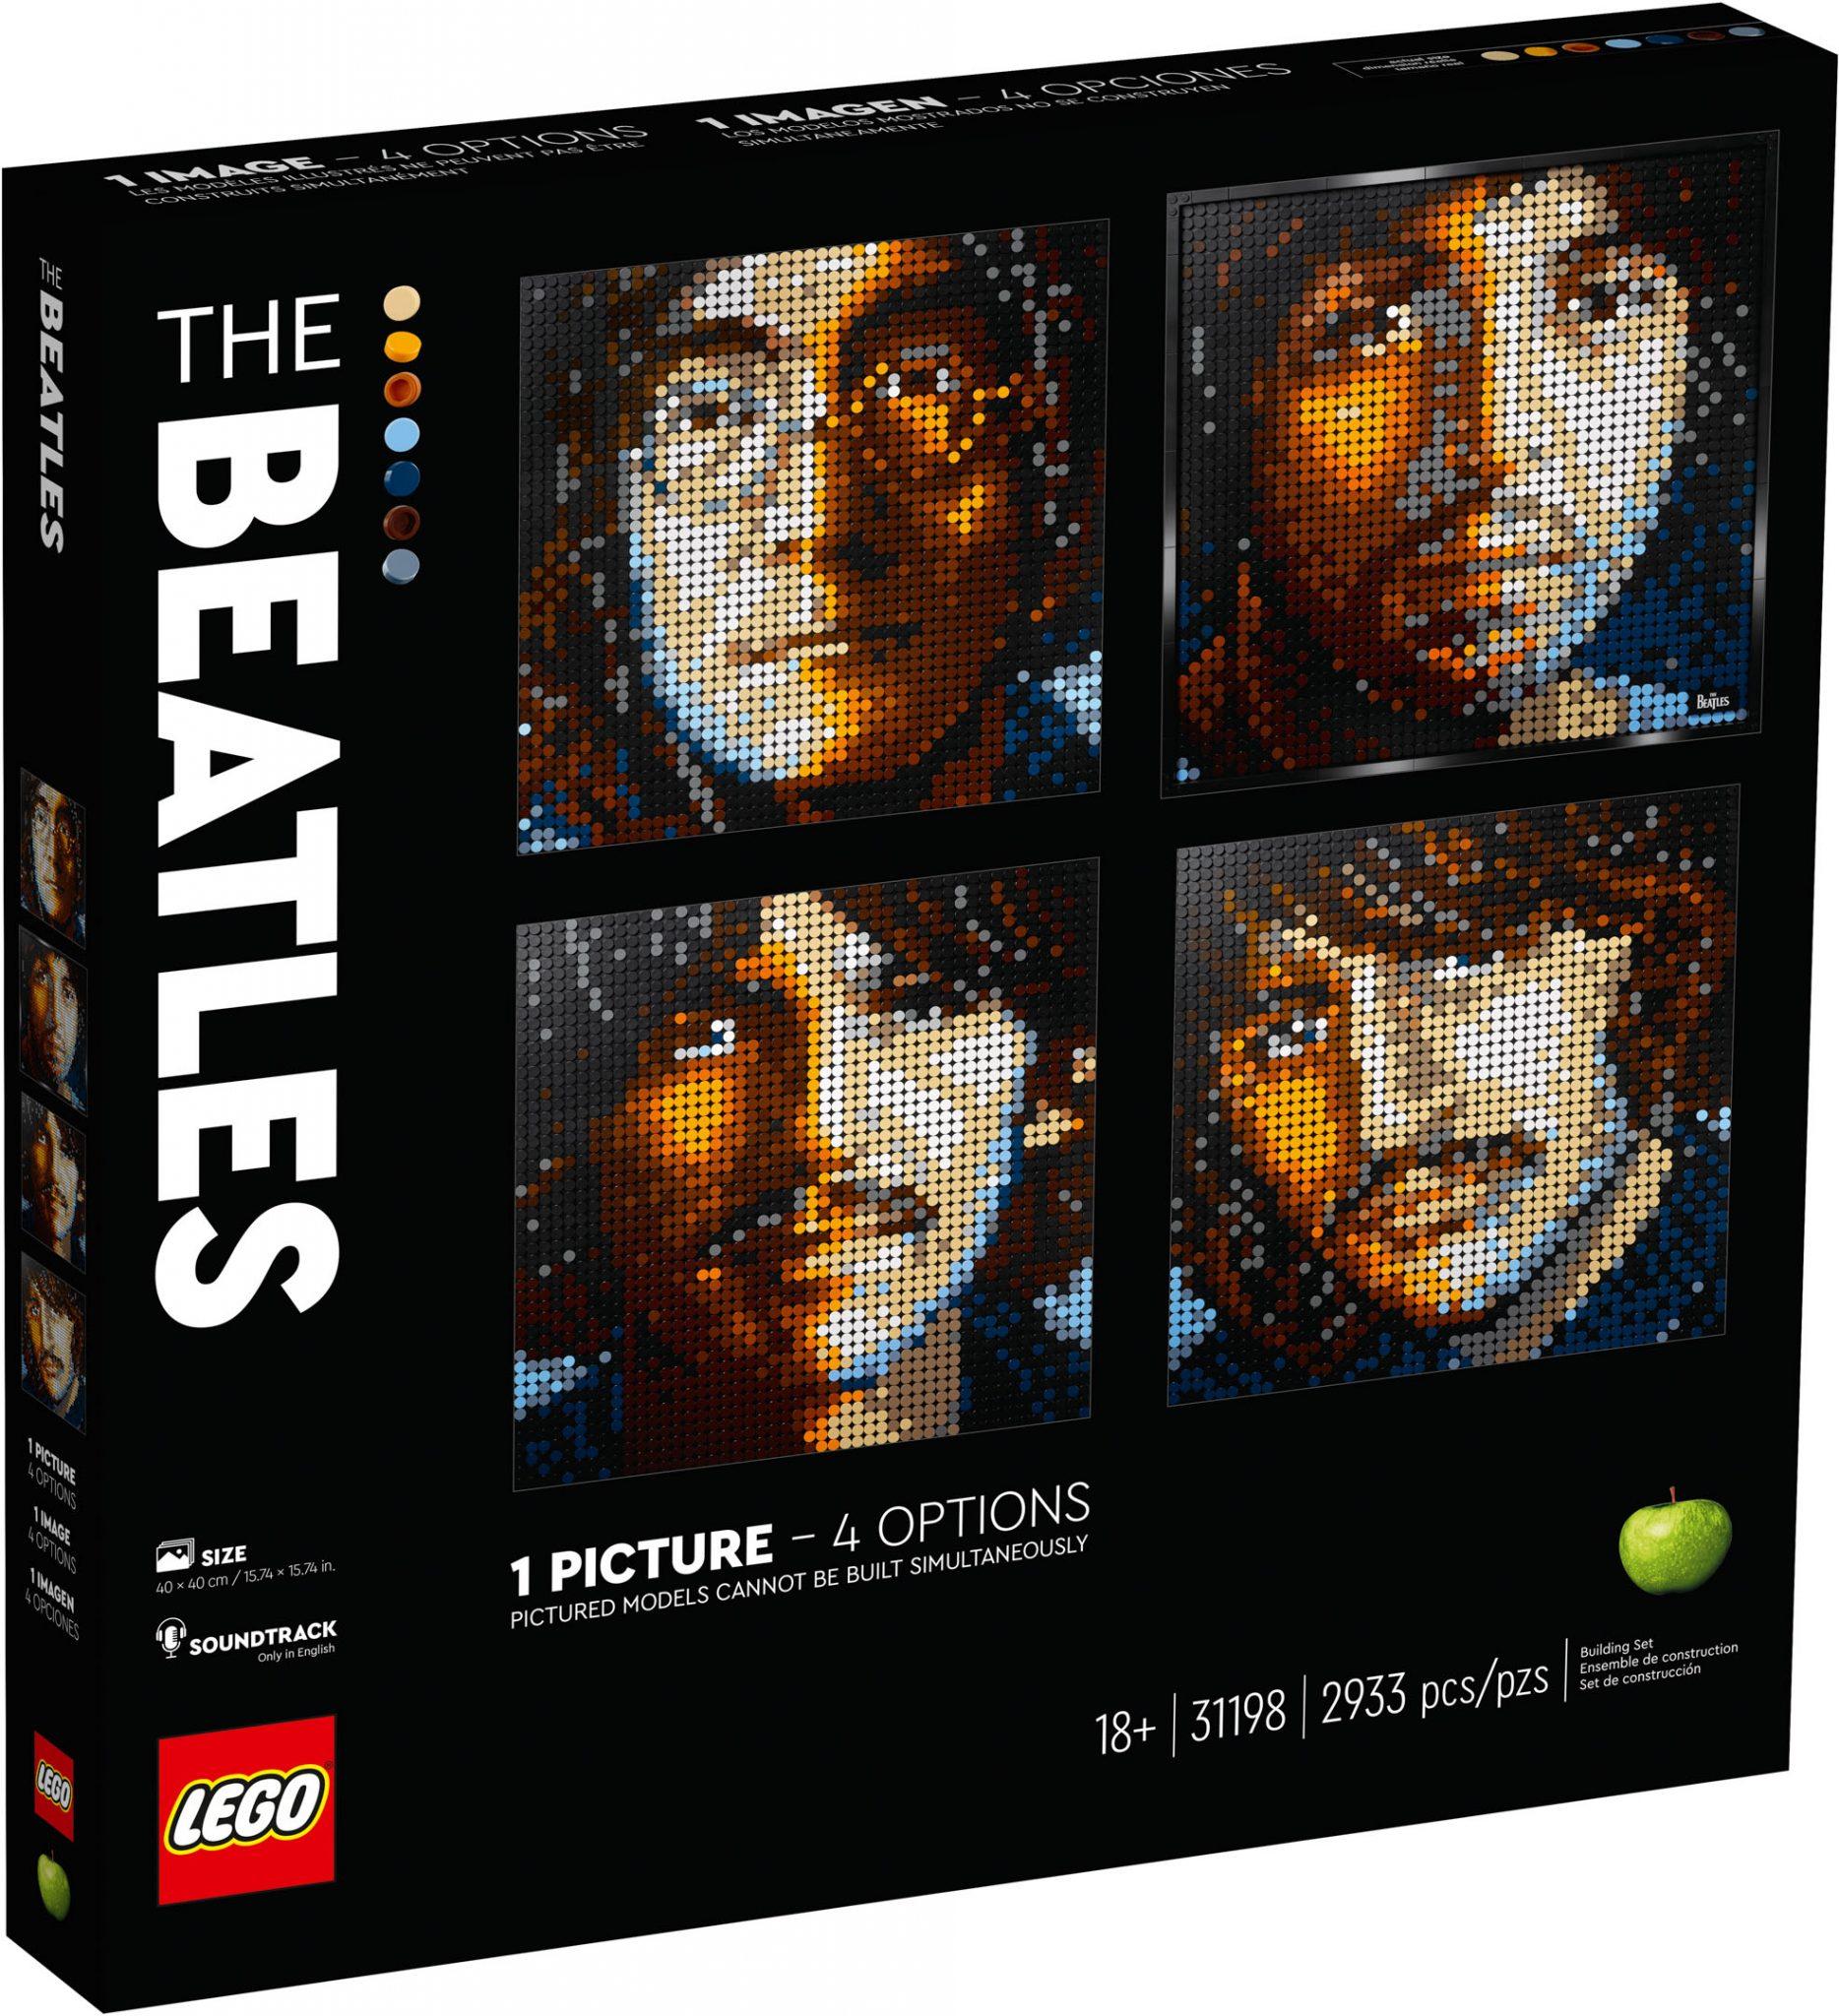 LEGO-Art-31198-The-Beatles-IWV57-4-1868x2048.jpg